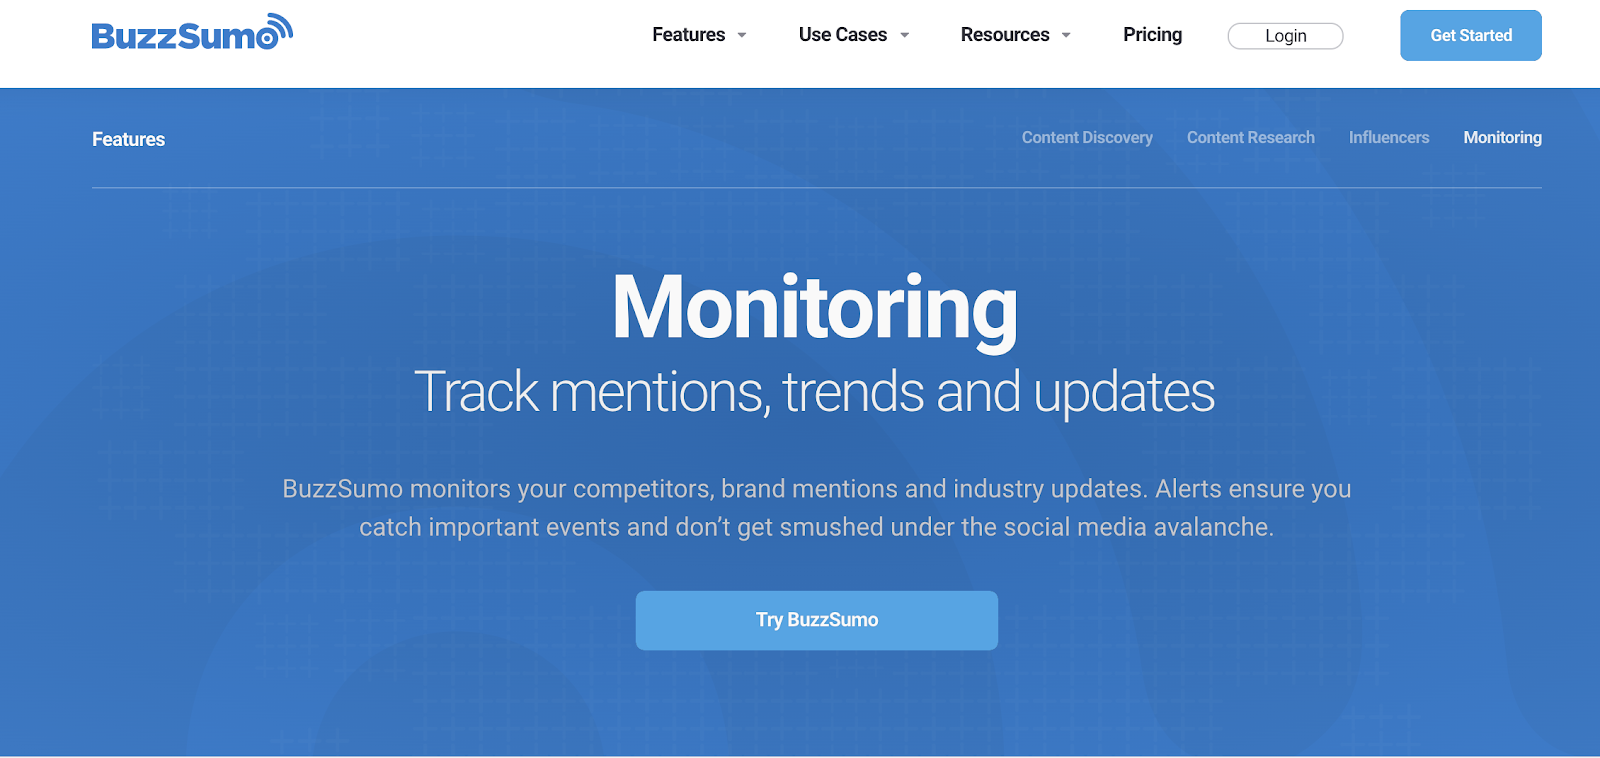 screenshot buzzsumo landing page - social media monitoring